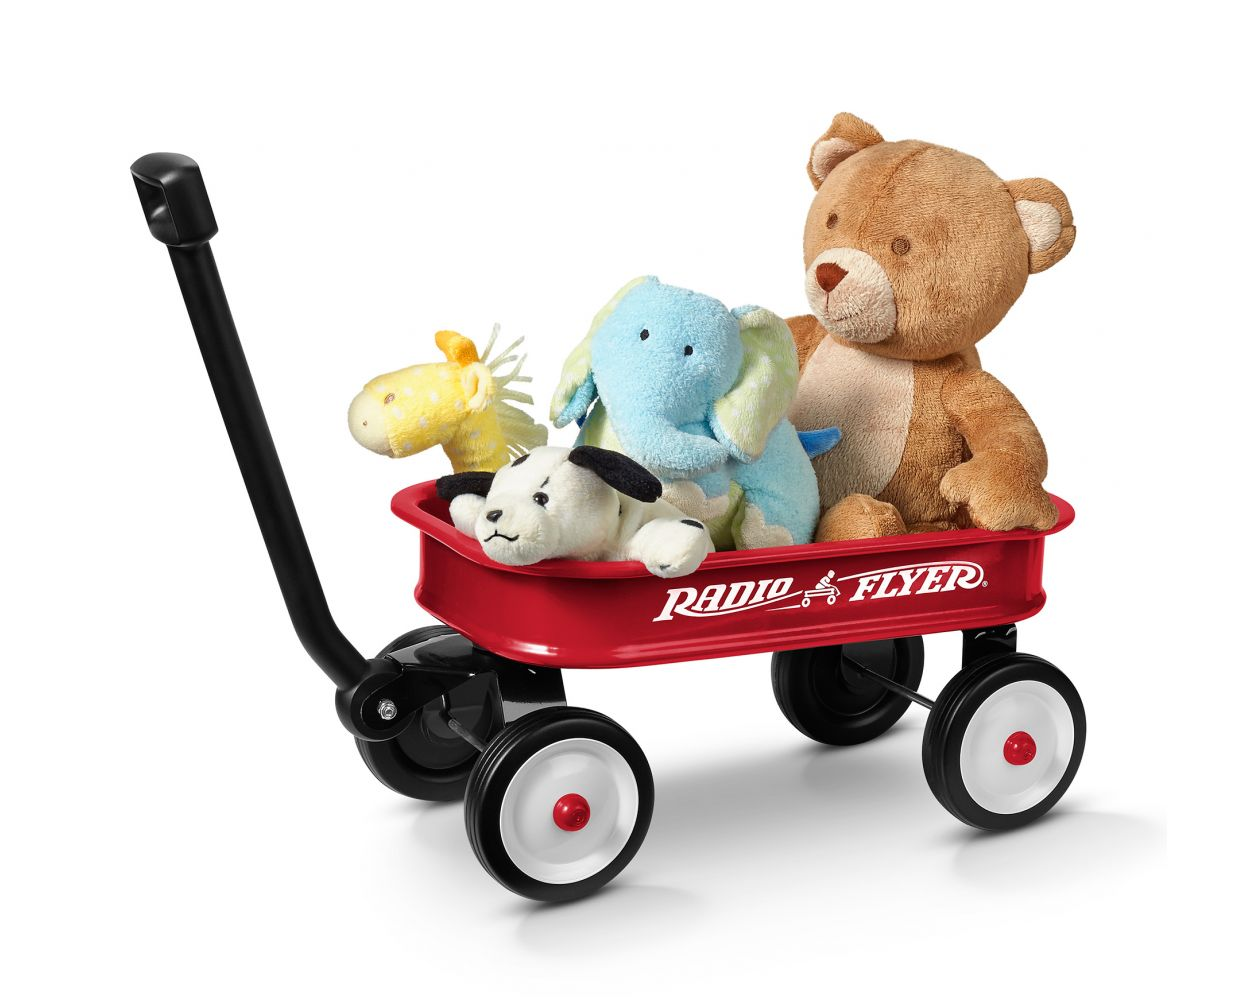 little-red-toy-wagon-stuffed-animals-inset-w5.jpg